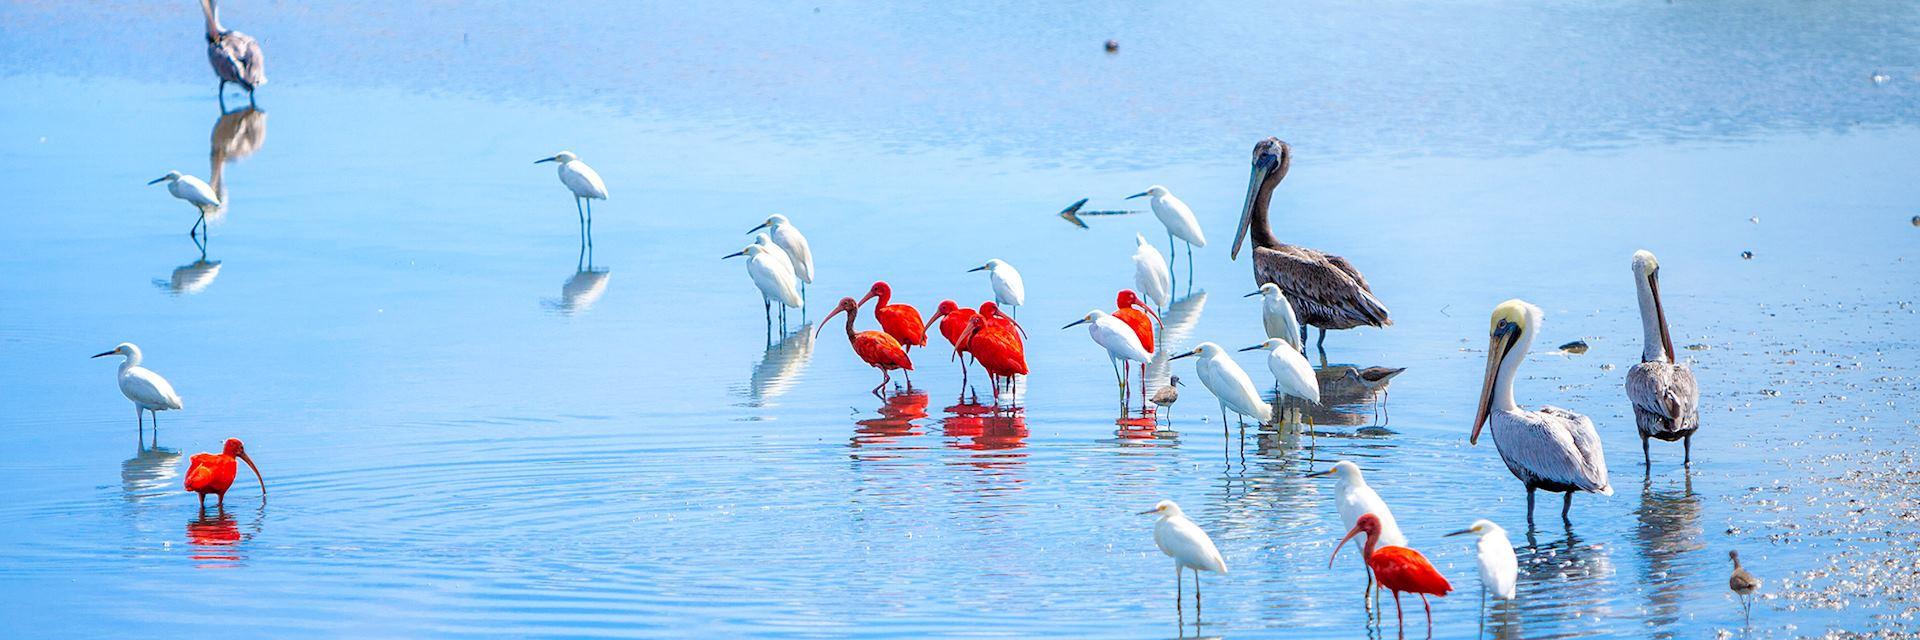 Tropical birds on Venezuela's Caribbean coast